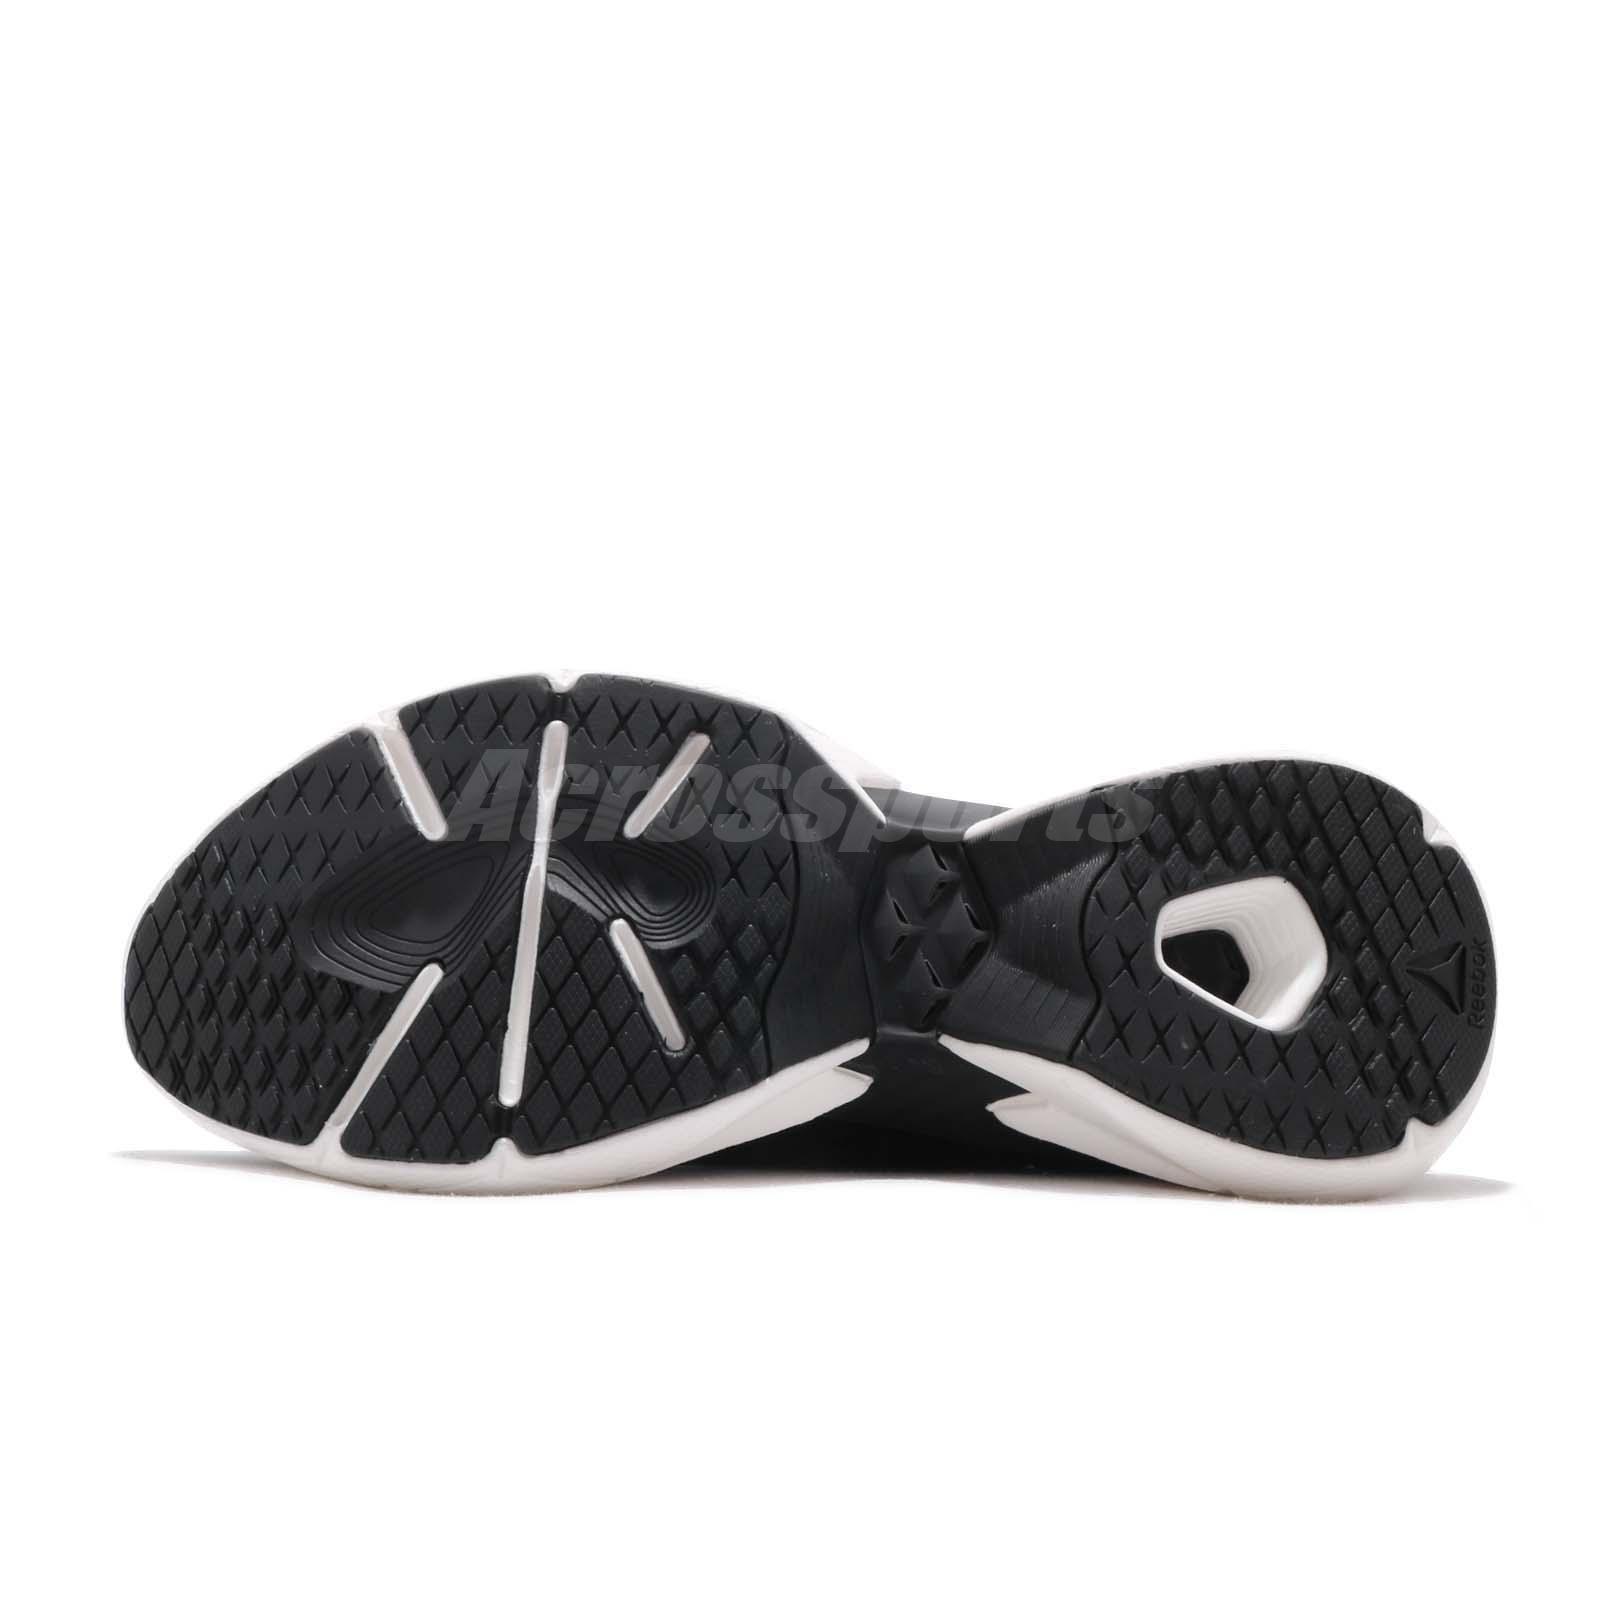 ebcbb782481 Reebok Sole Fury Floatride Black Grey Red White Men Running Shoes ...